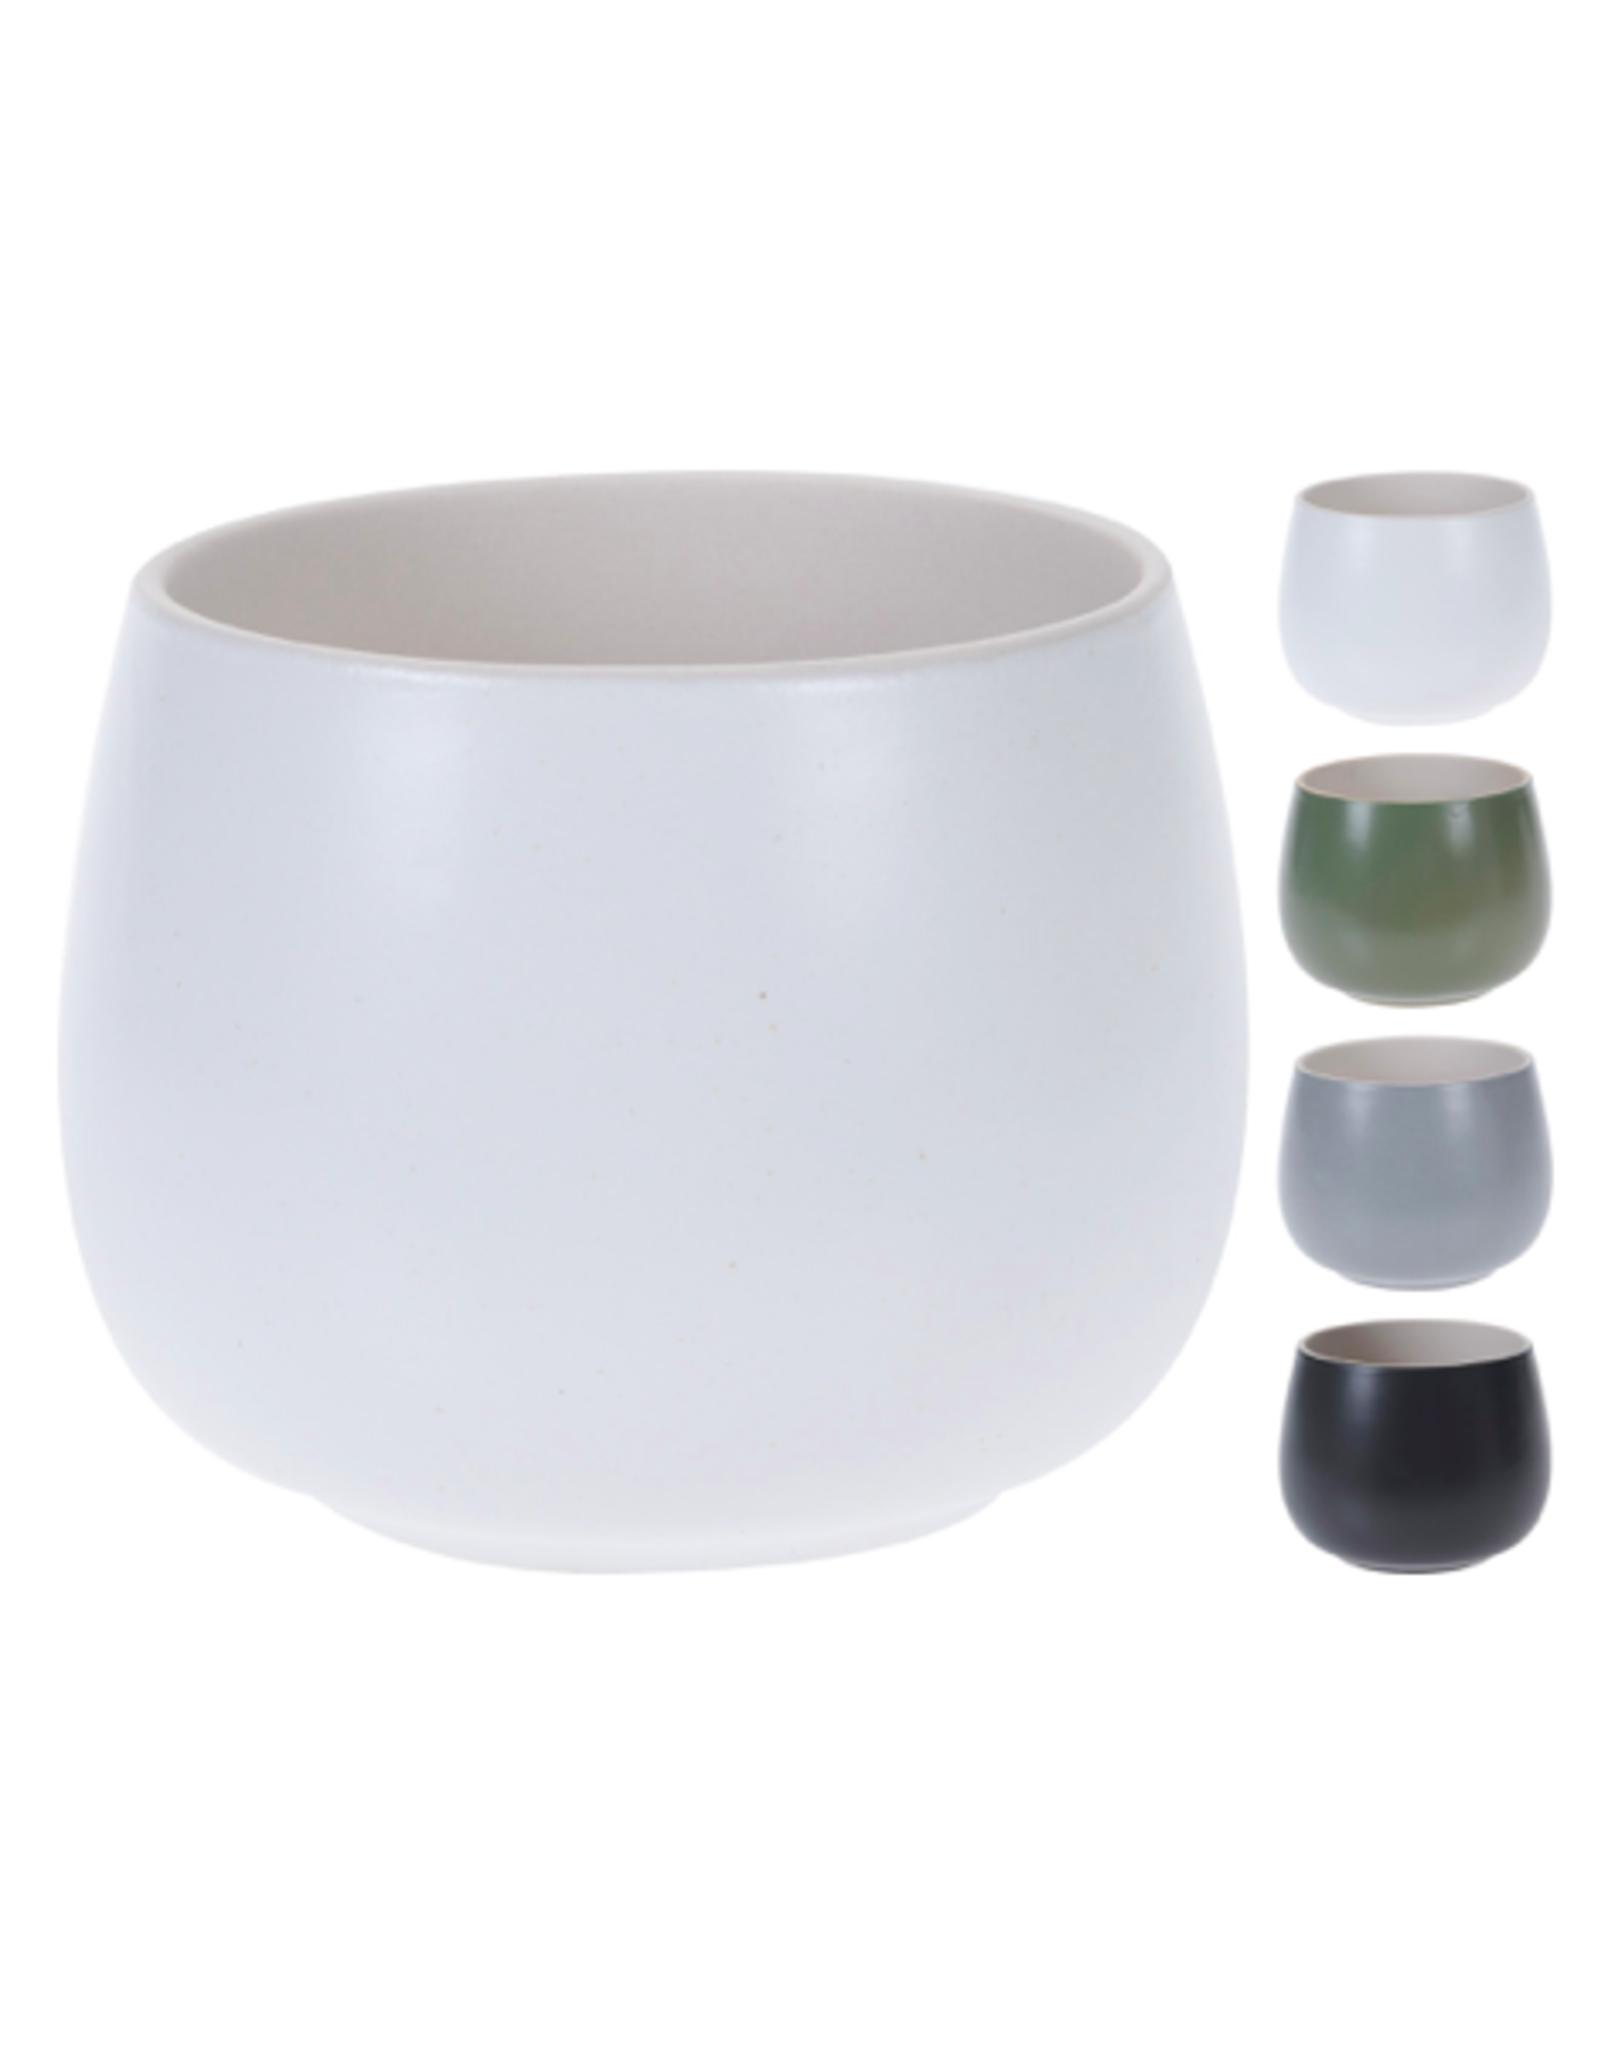 "NTH - Plant Pot / Tranquil, Grey, 3.5"""